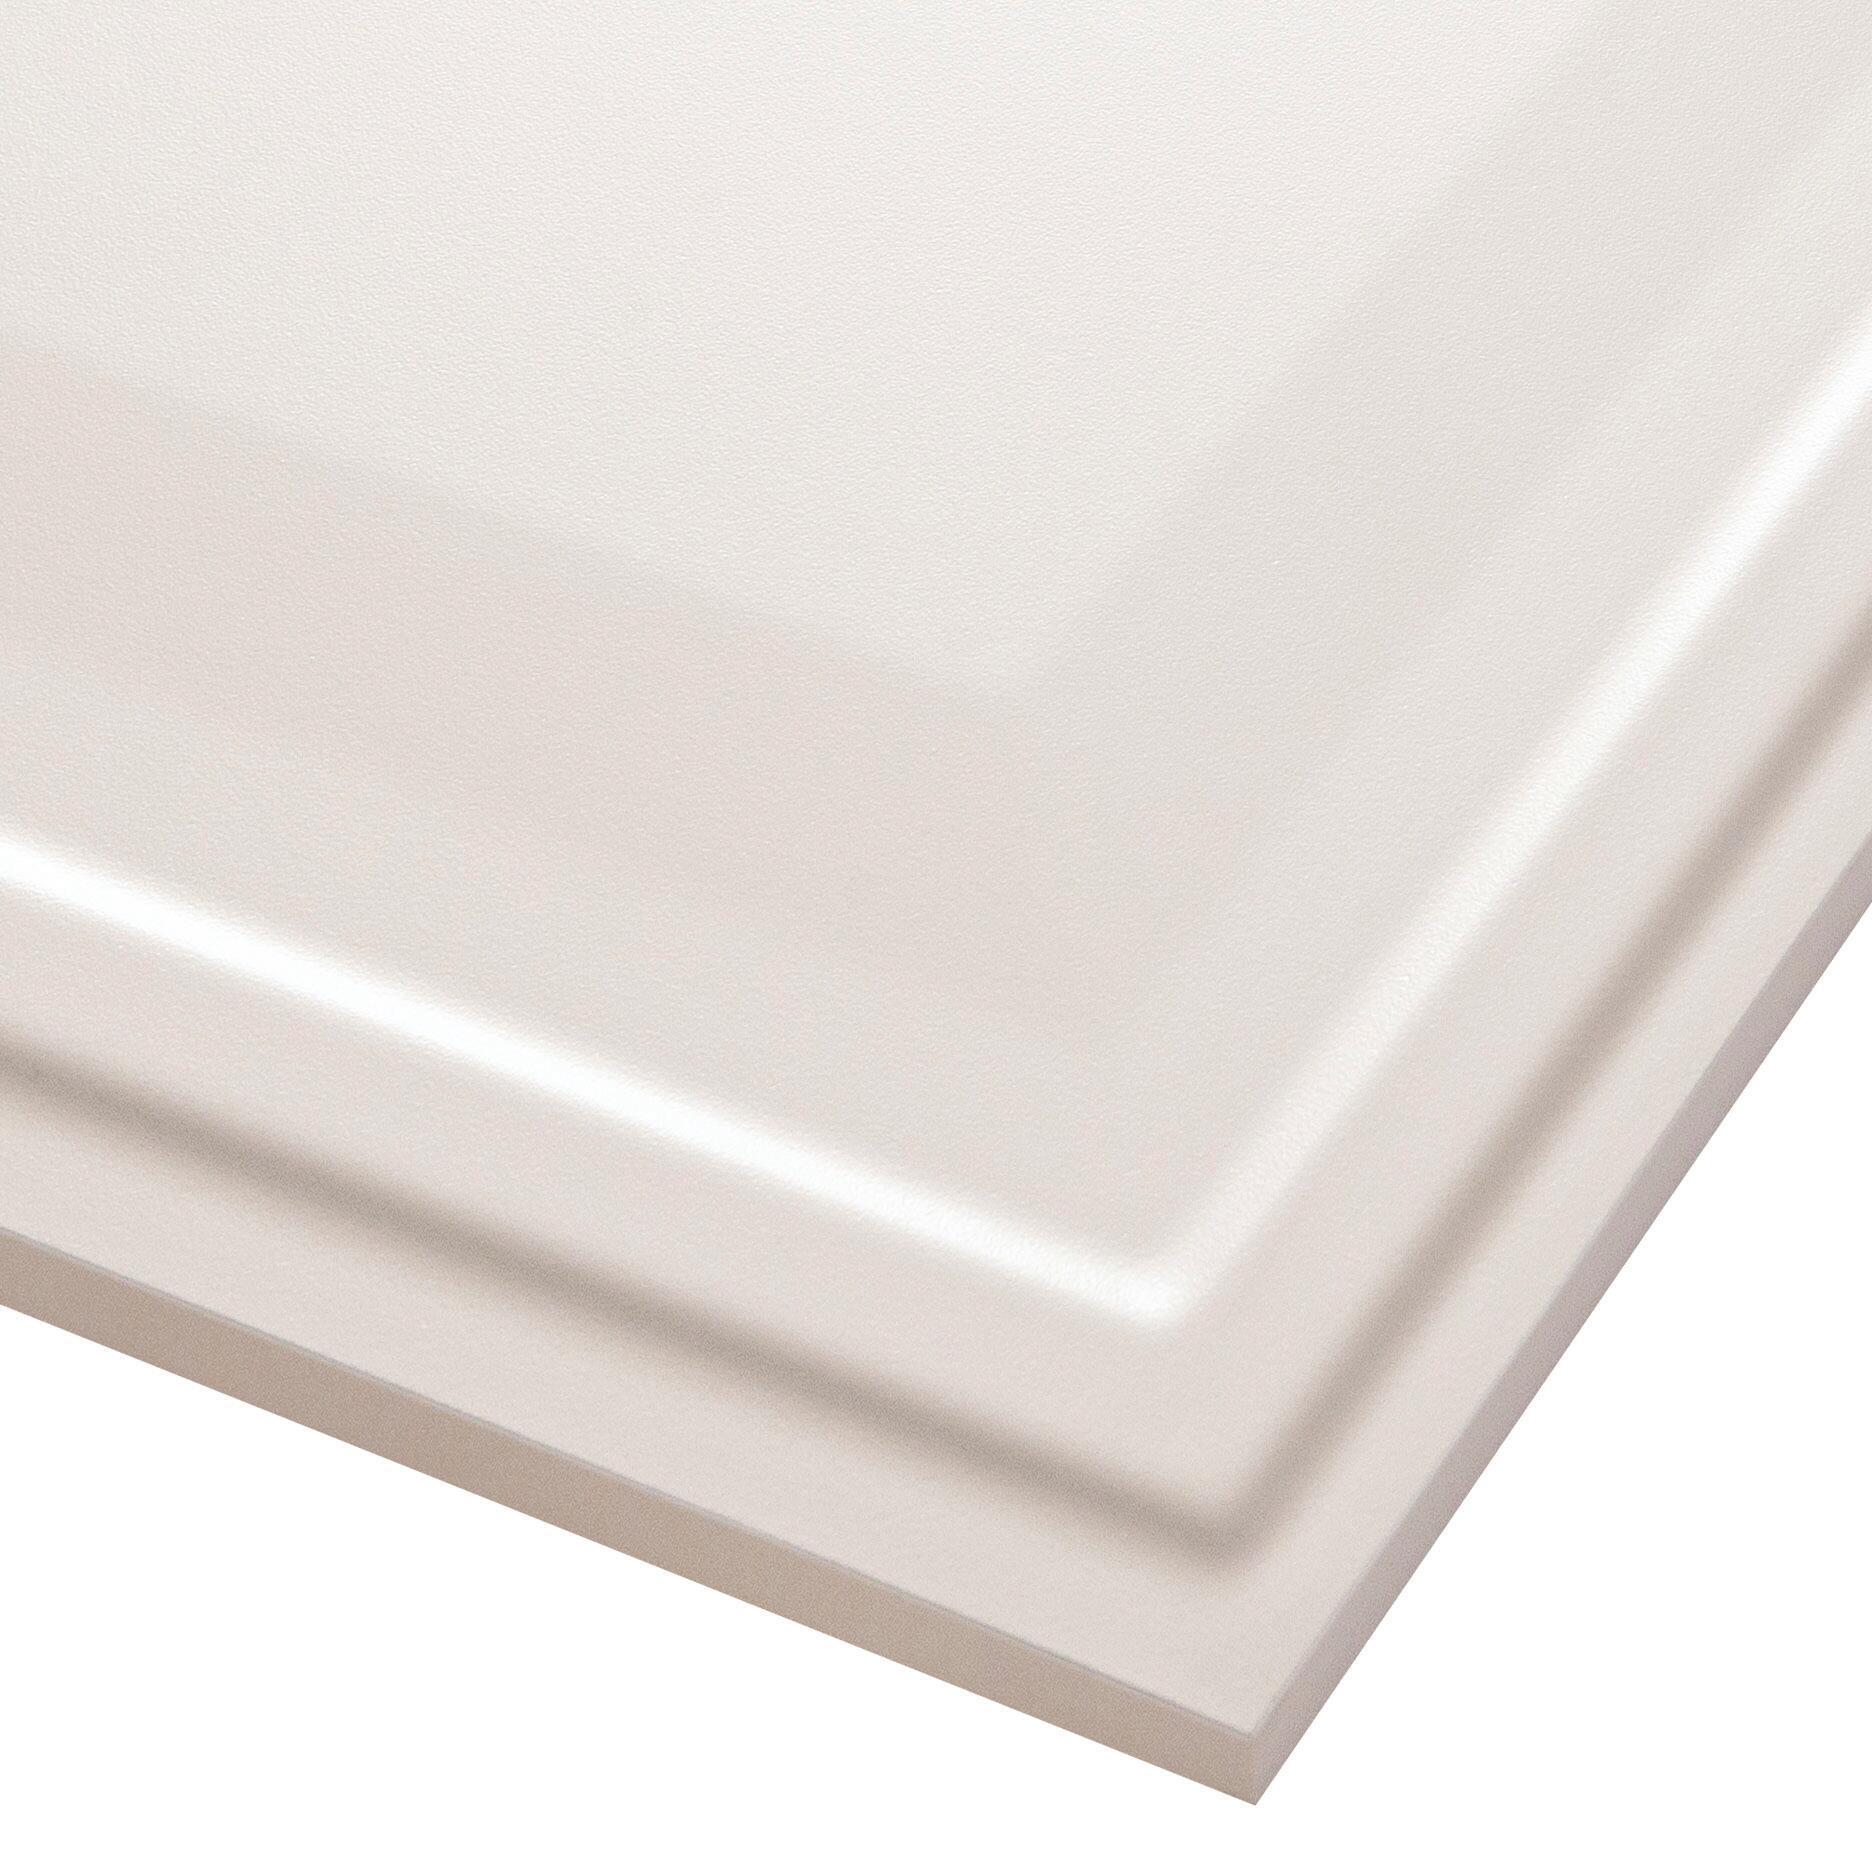 Piastrella per rivestimenti New Classic 30 x 56 cm sp. 10 mm bianco - 3